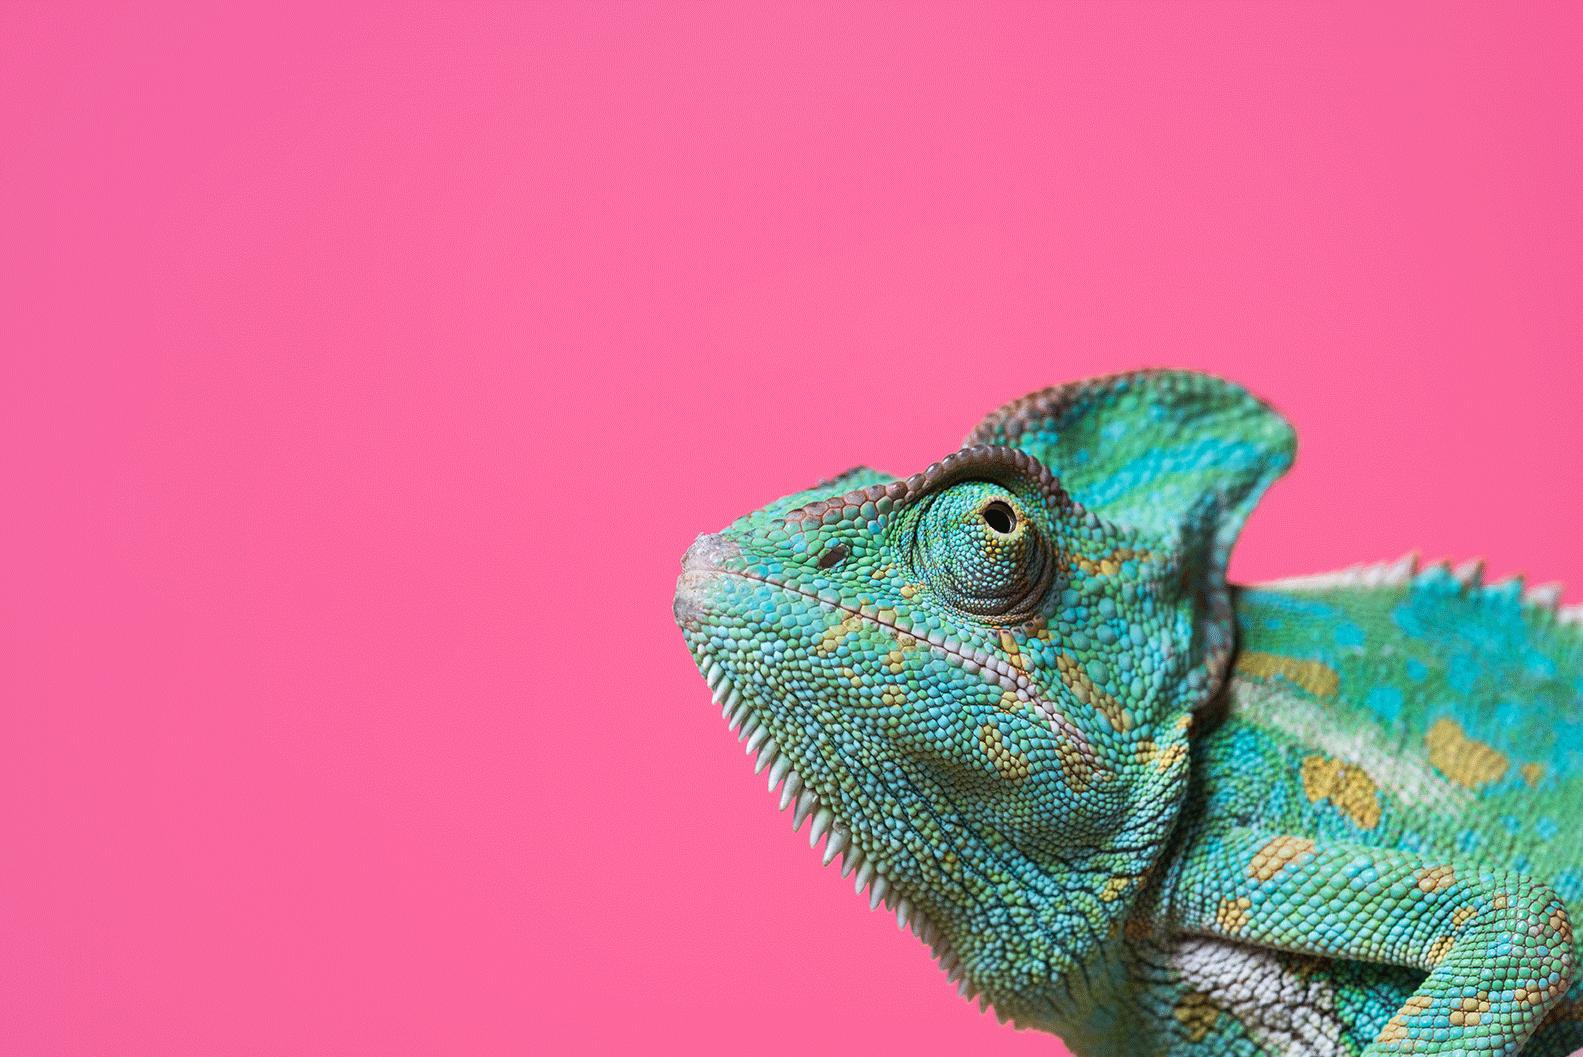 Rosa-Chameleon_72dpi